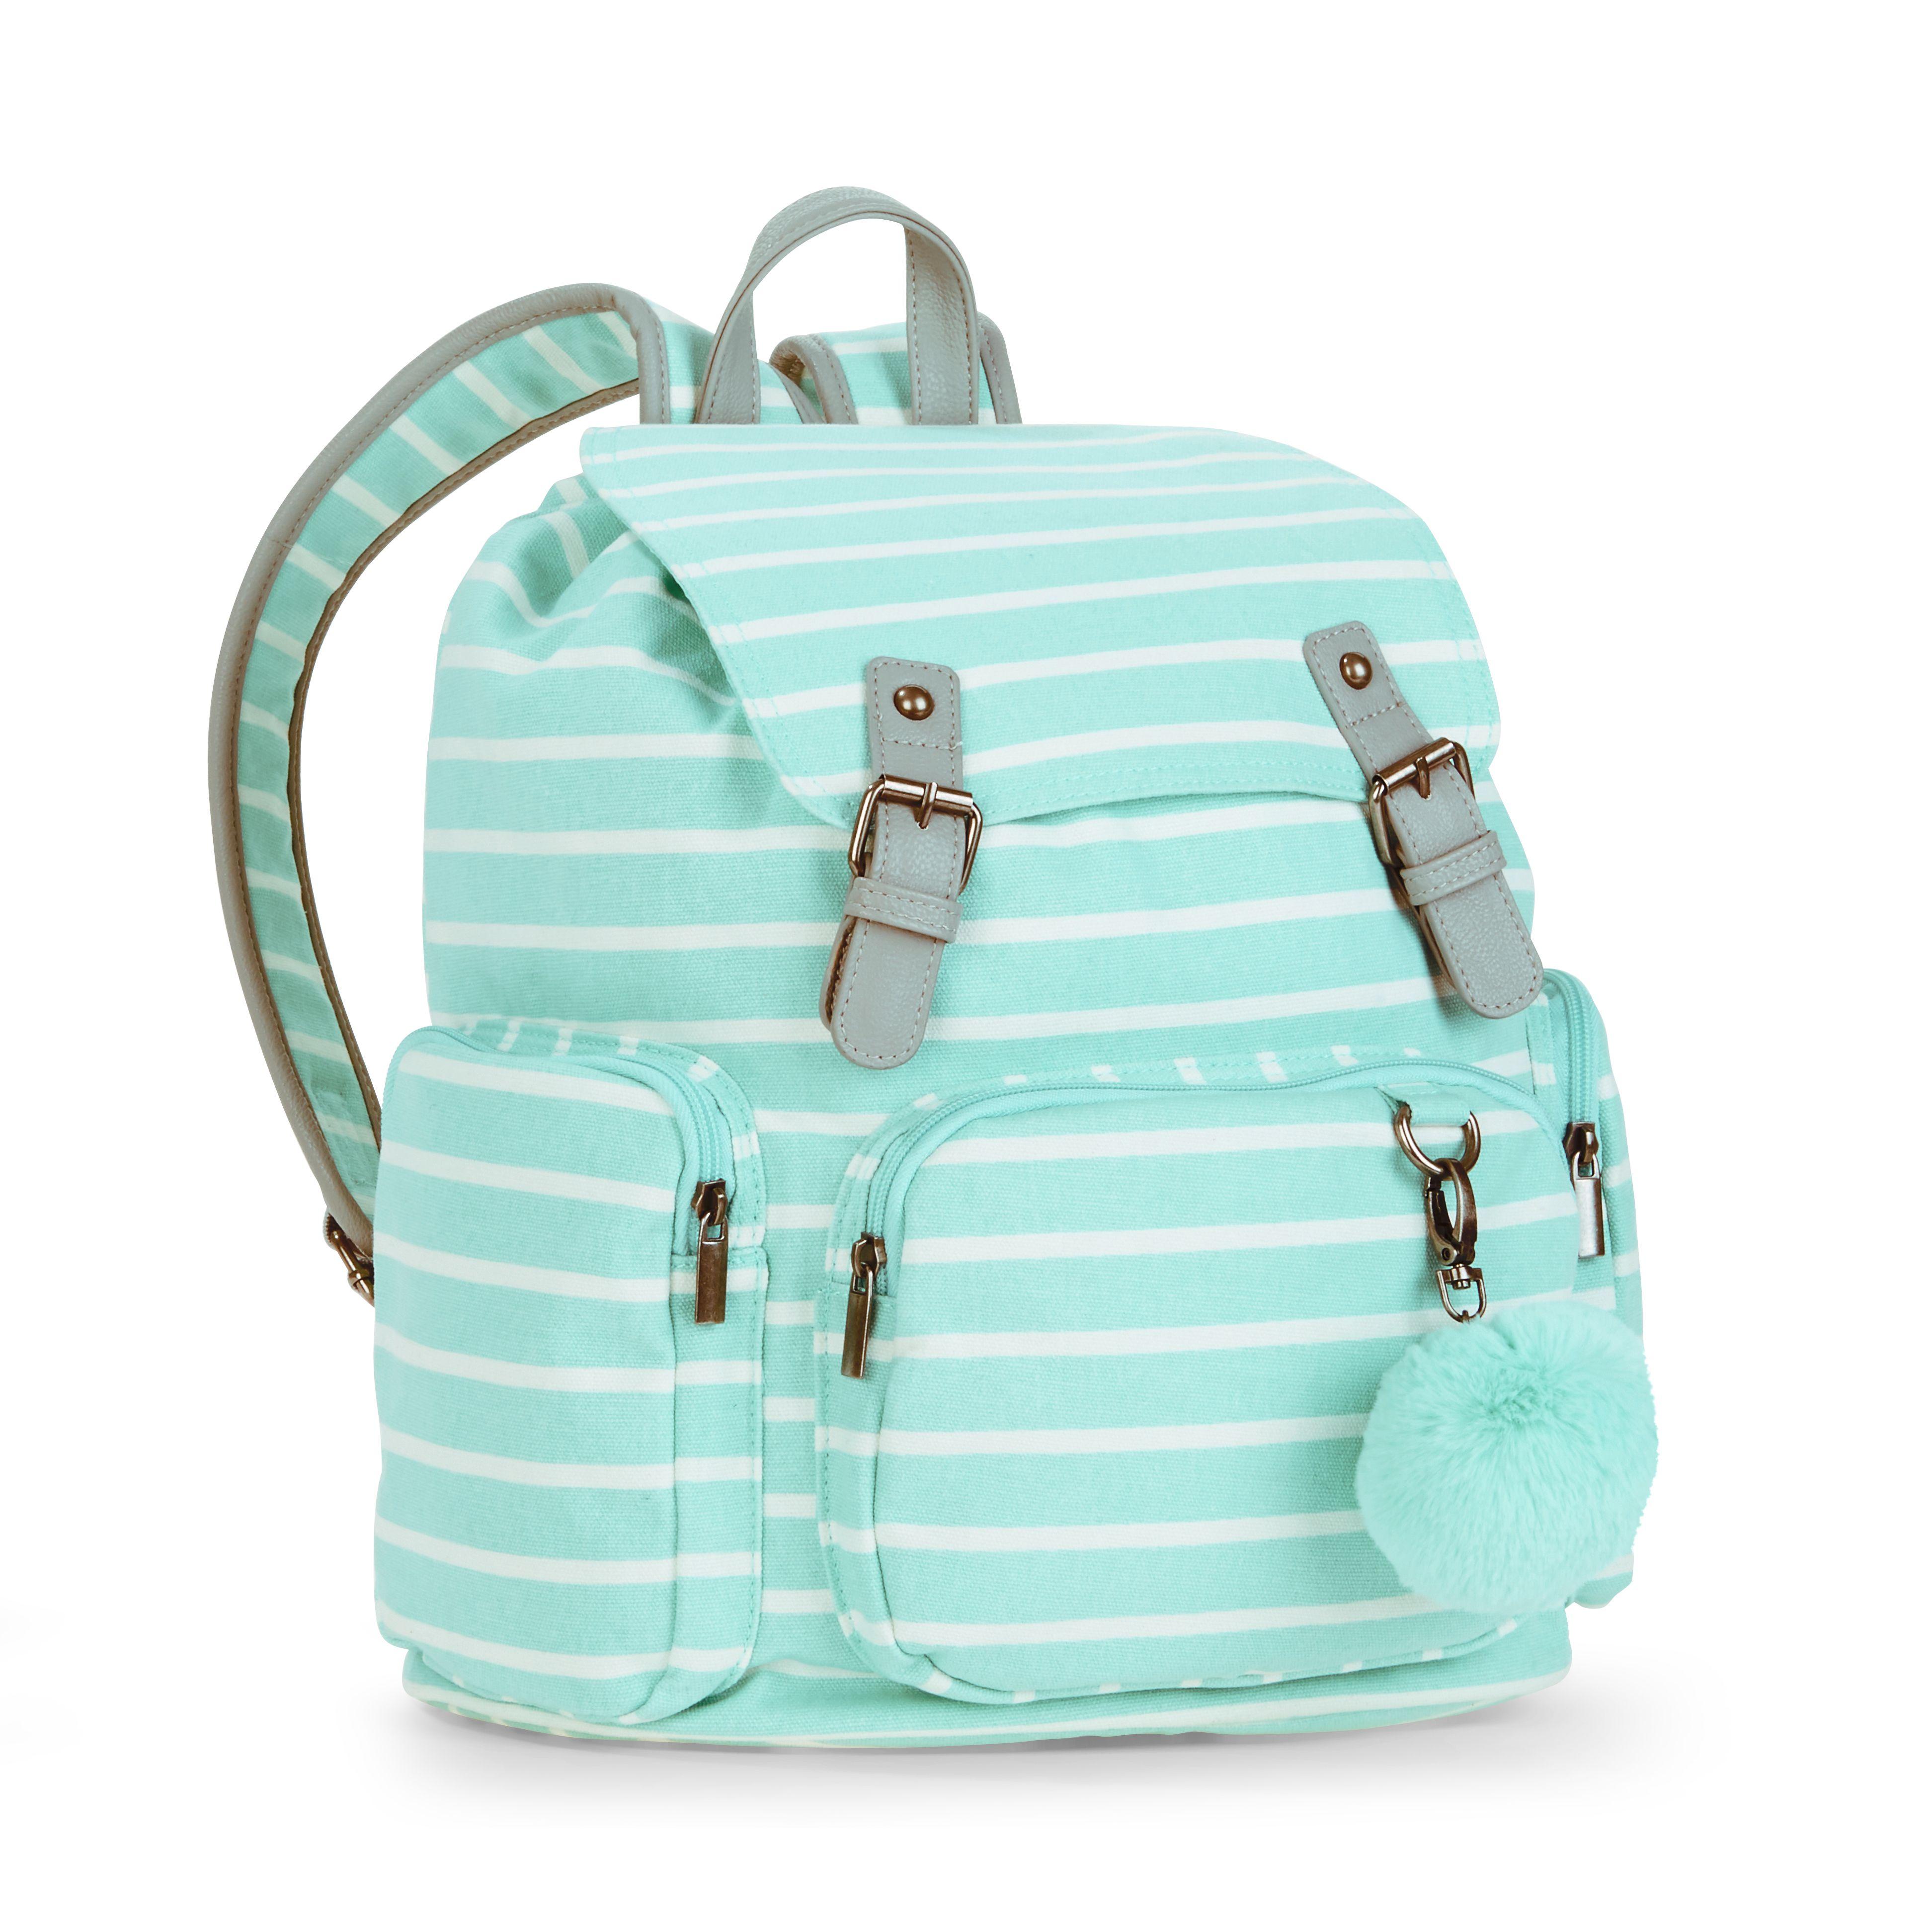 No Boundaries Mint Stripe Cargo Backpack - Walmart.com | Accessories ...